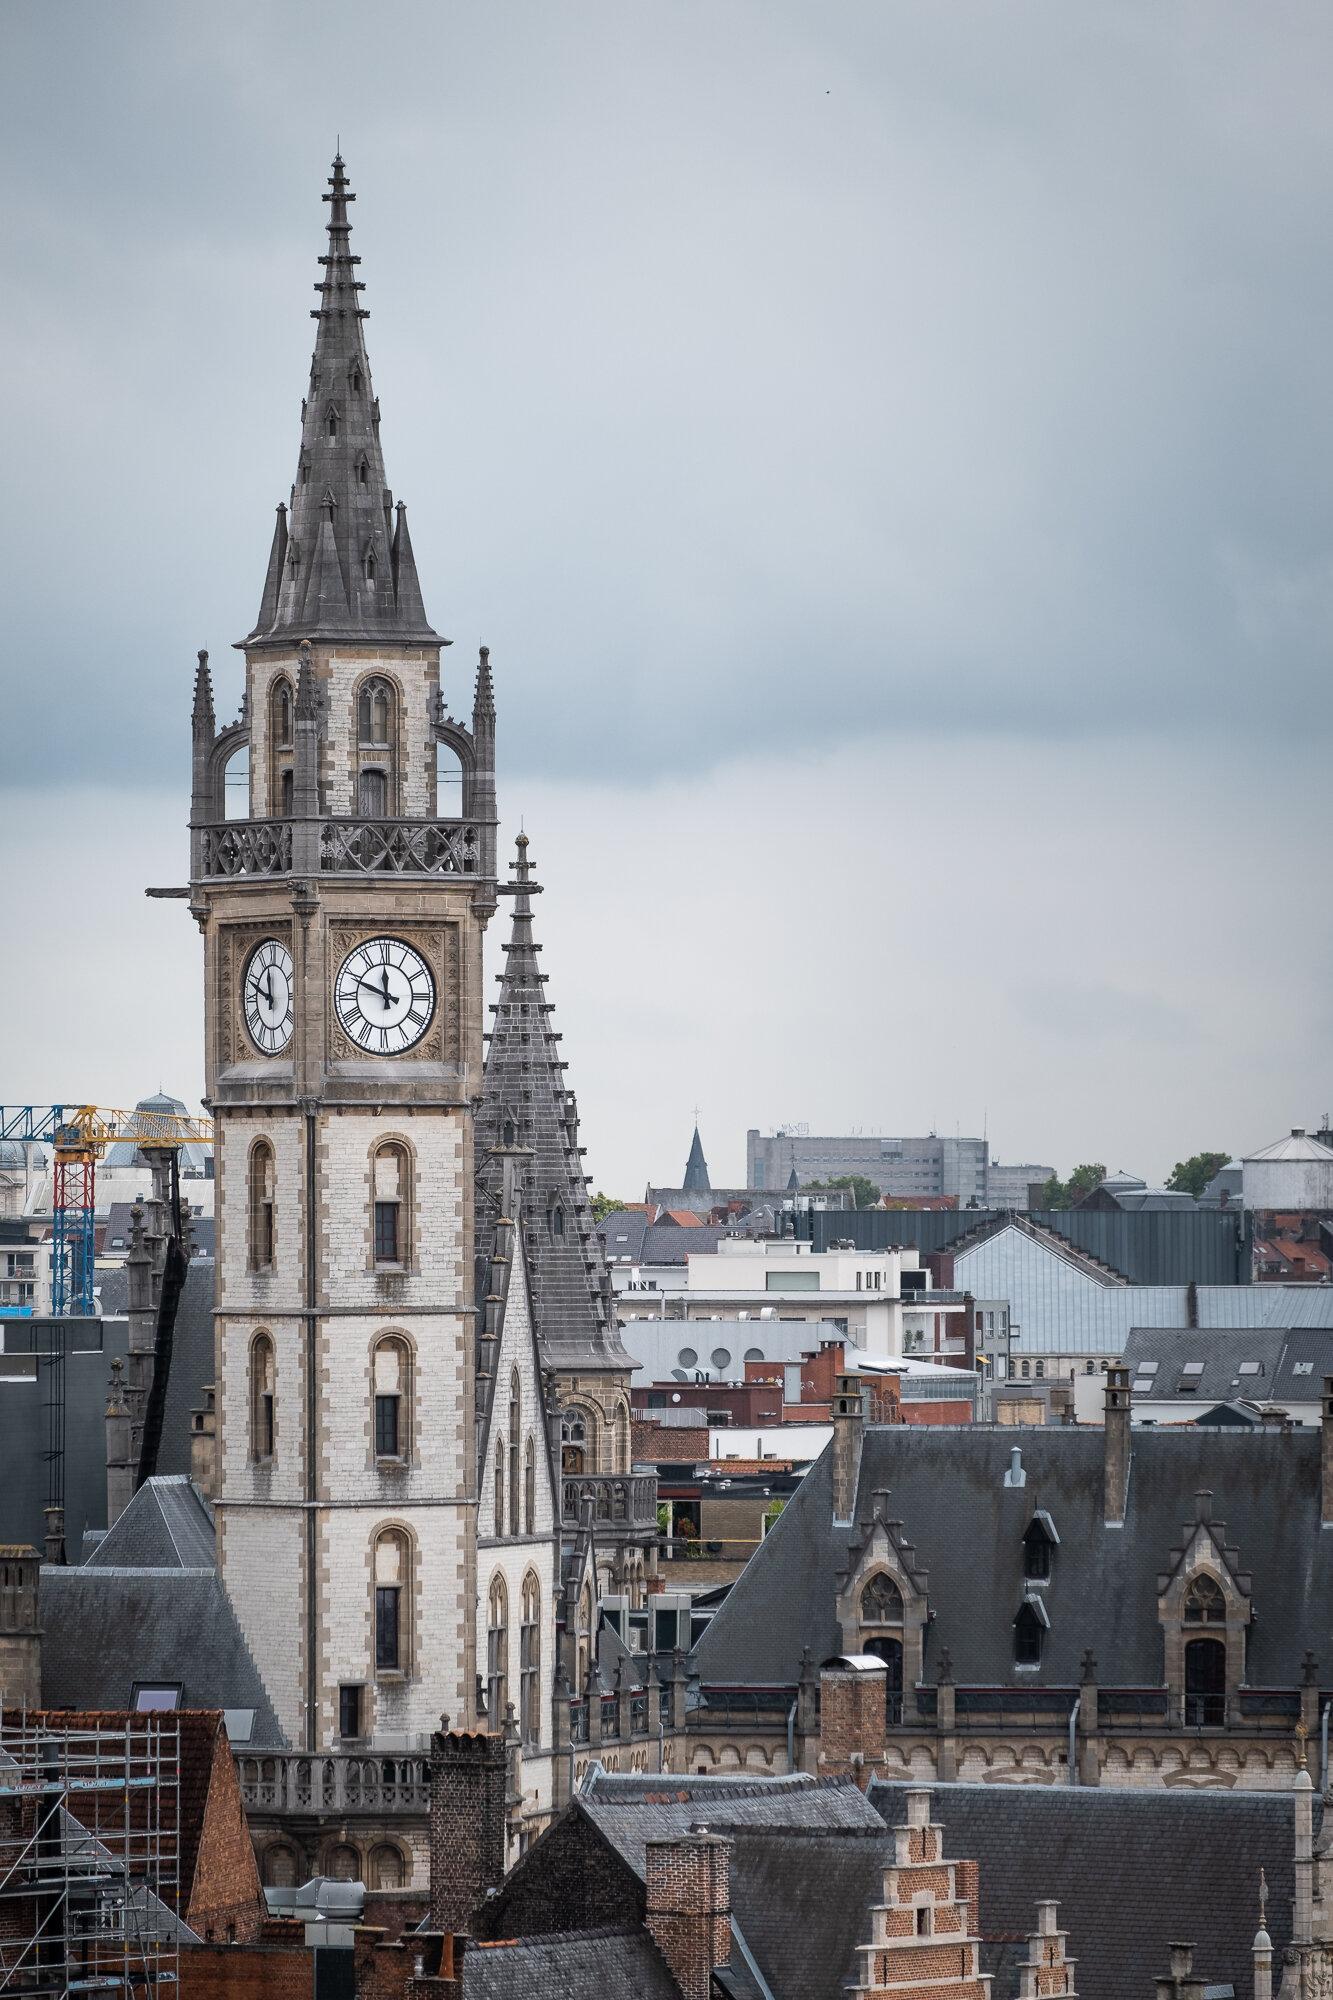 The Ghent Clock Tower taken from Gravensteen Castle